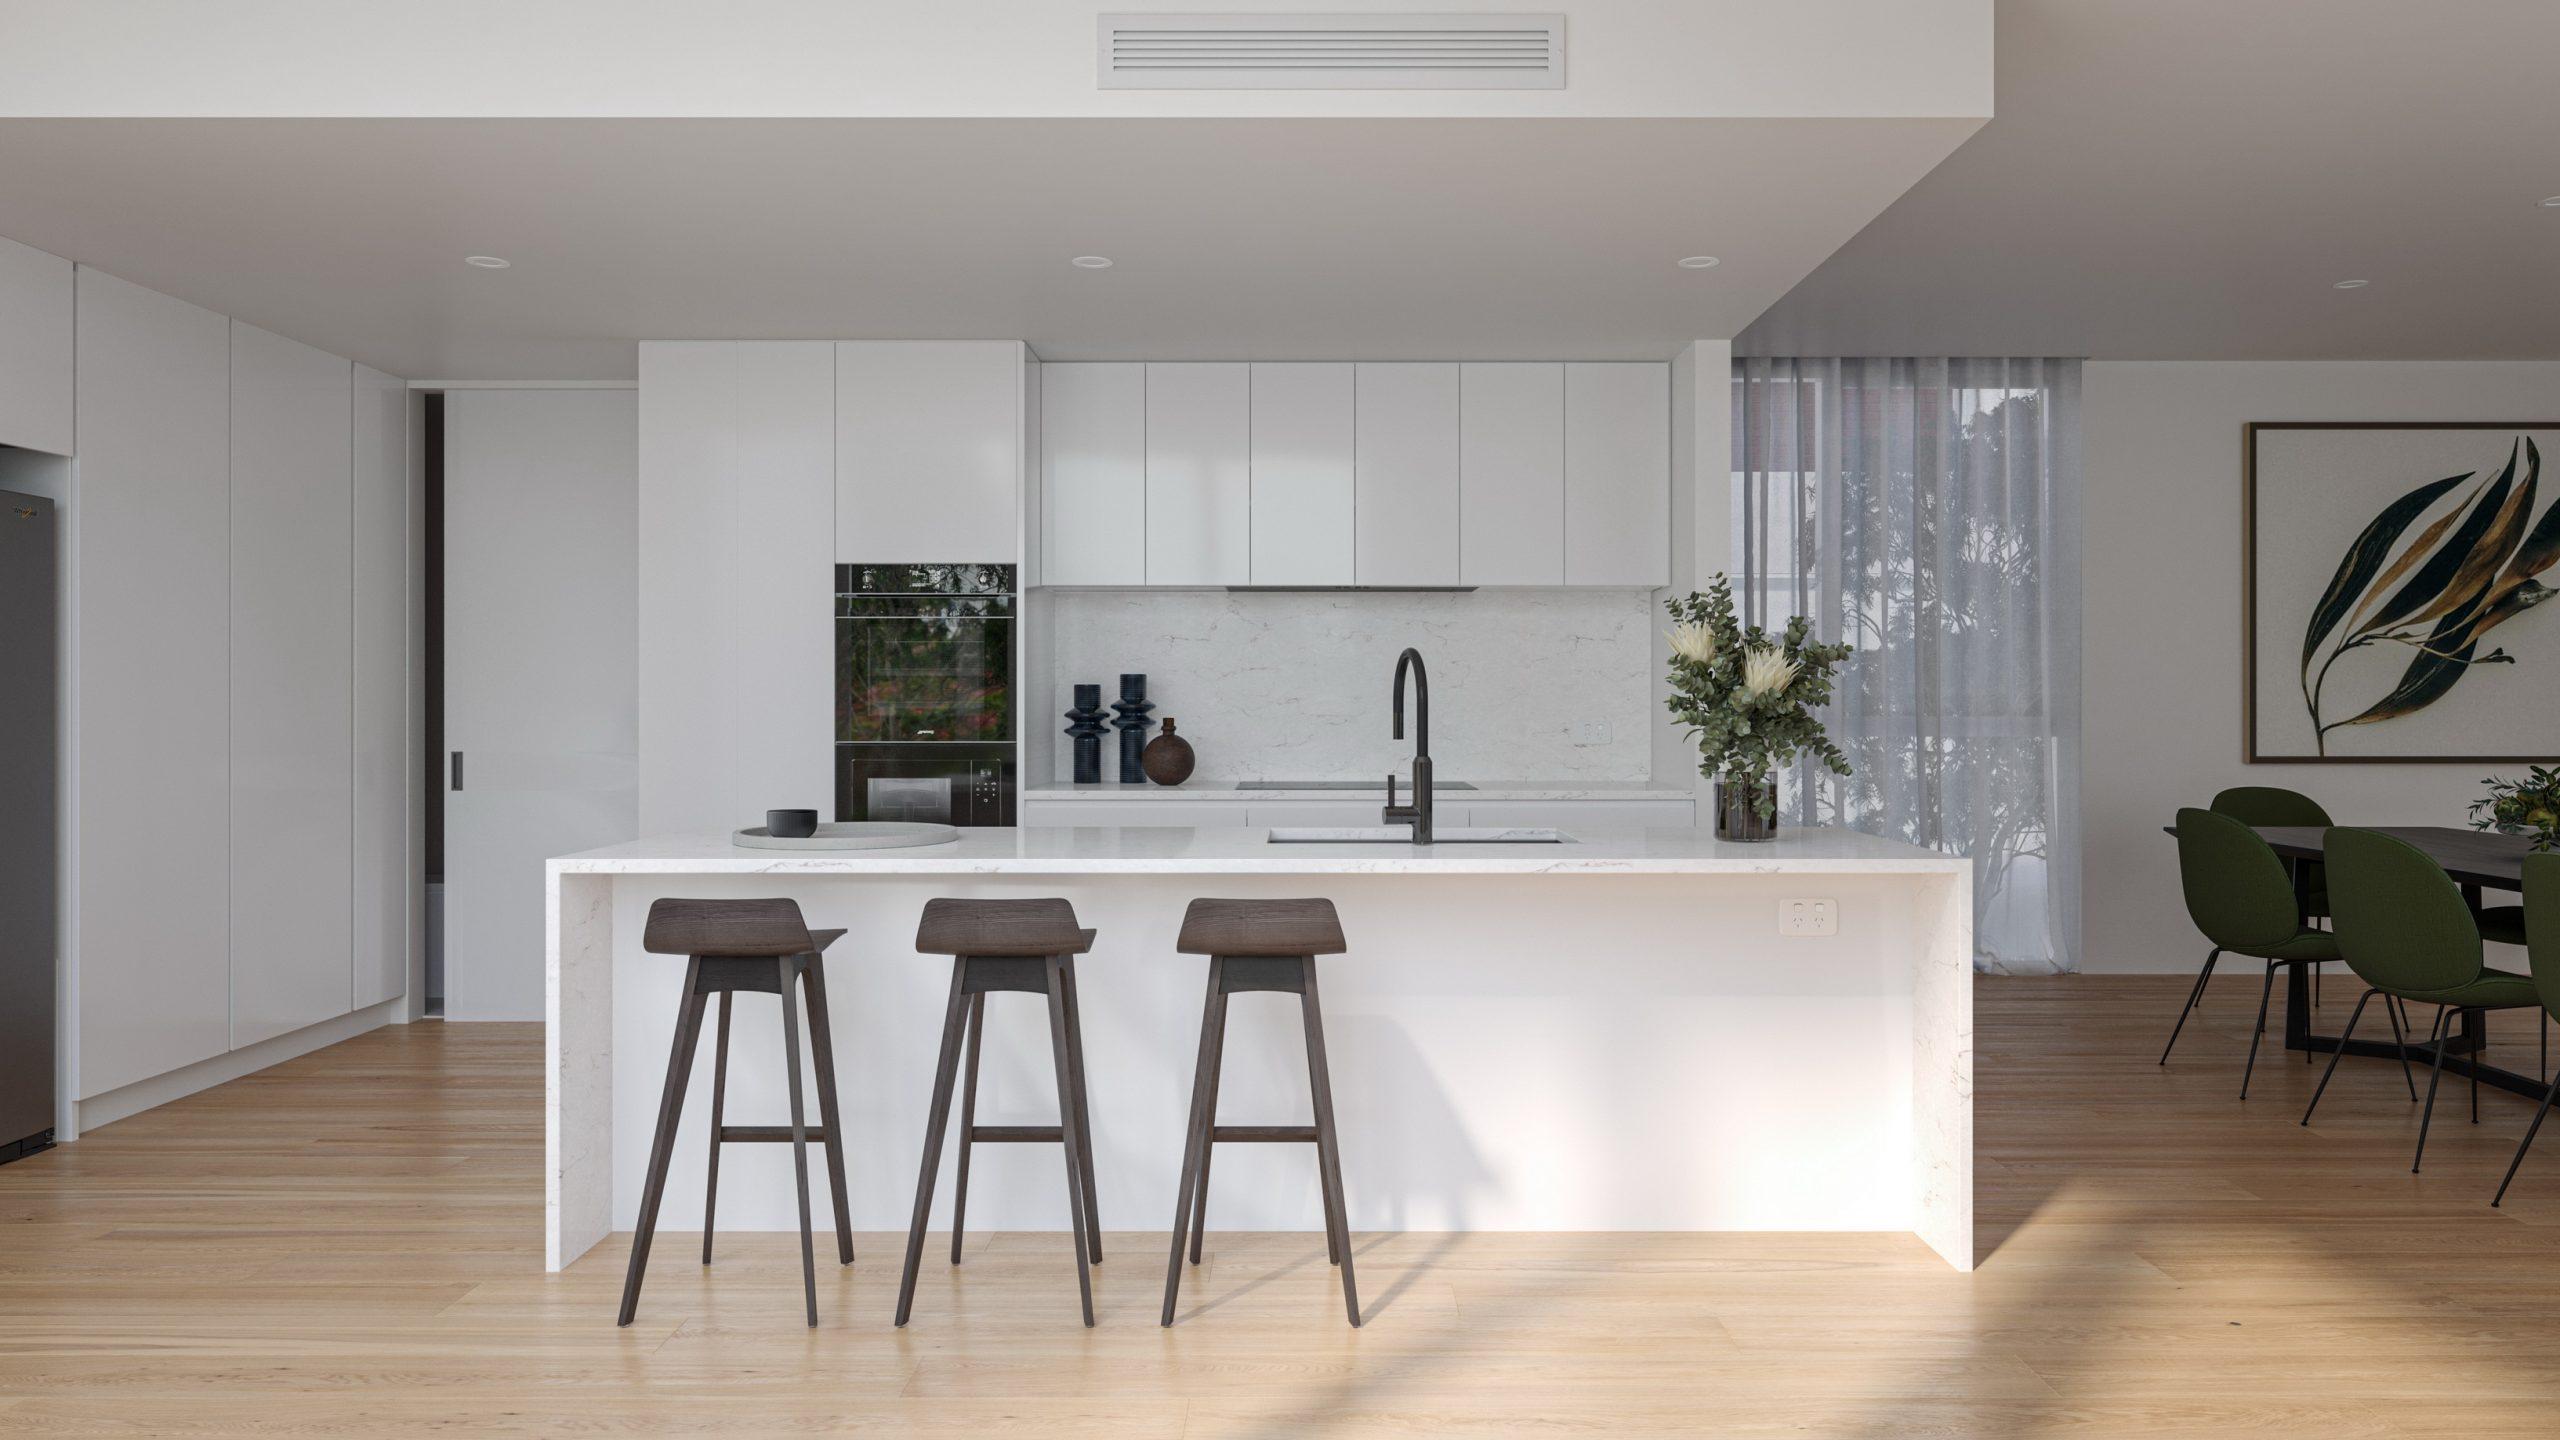 fkd-studio-render-architecture-image-the-grounds-interior-ivanhoe-residential-kitchen